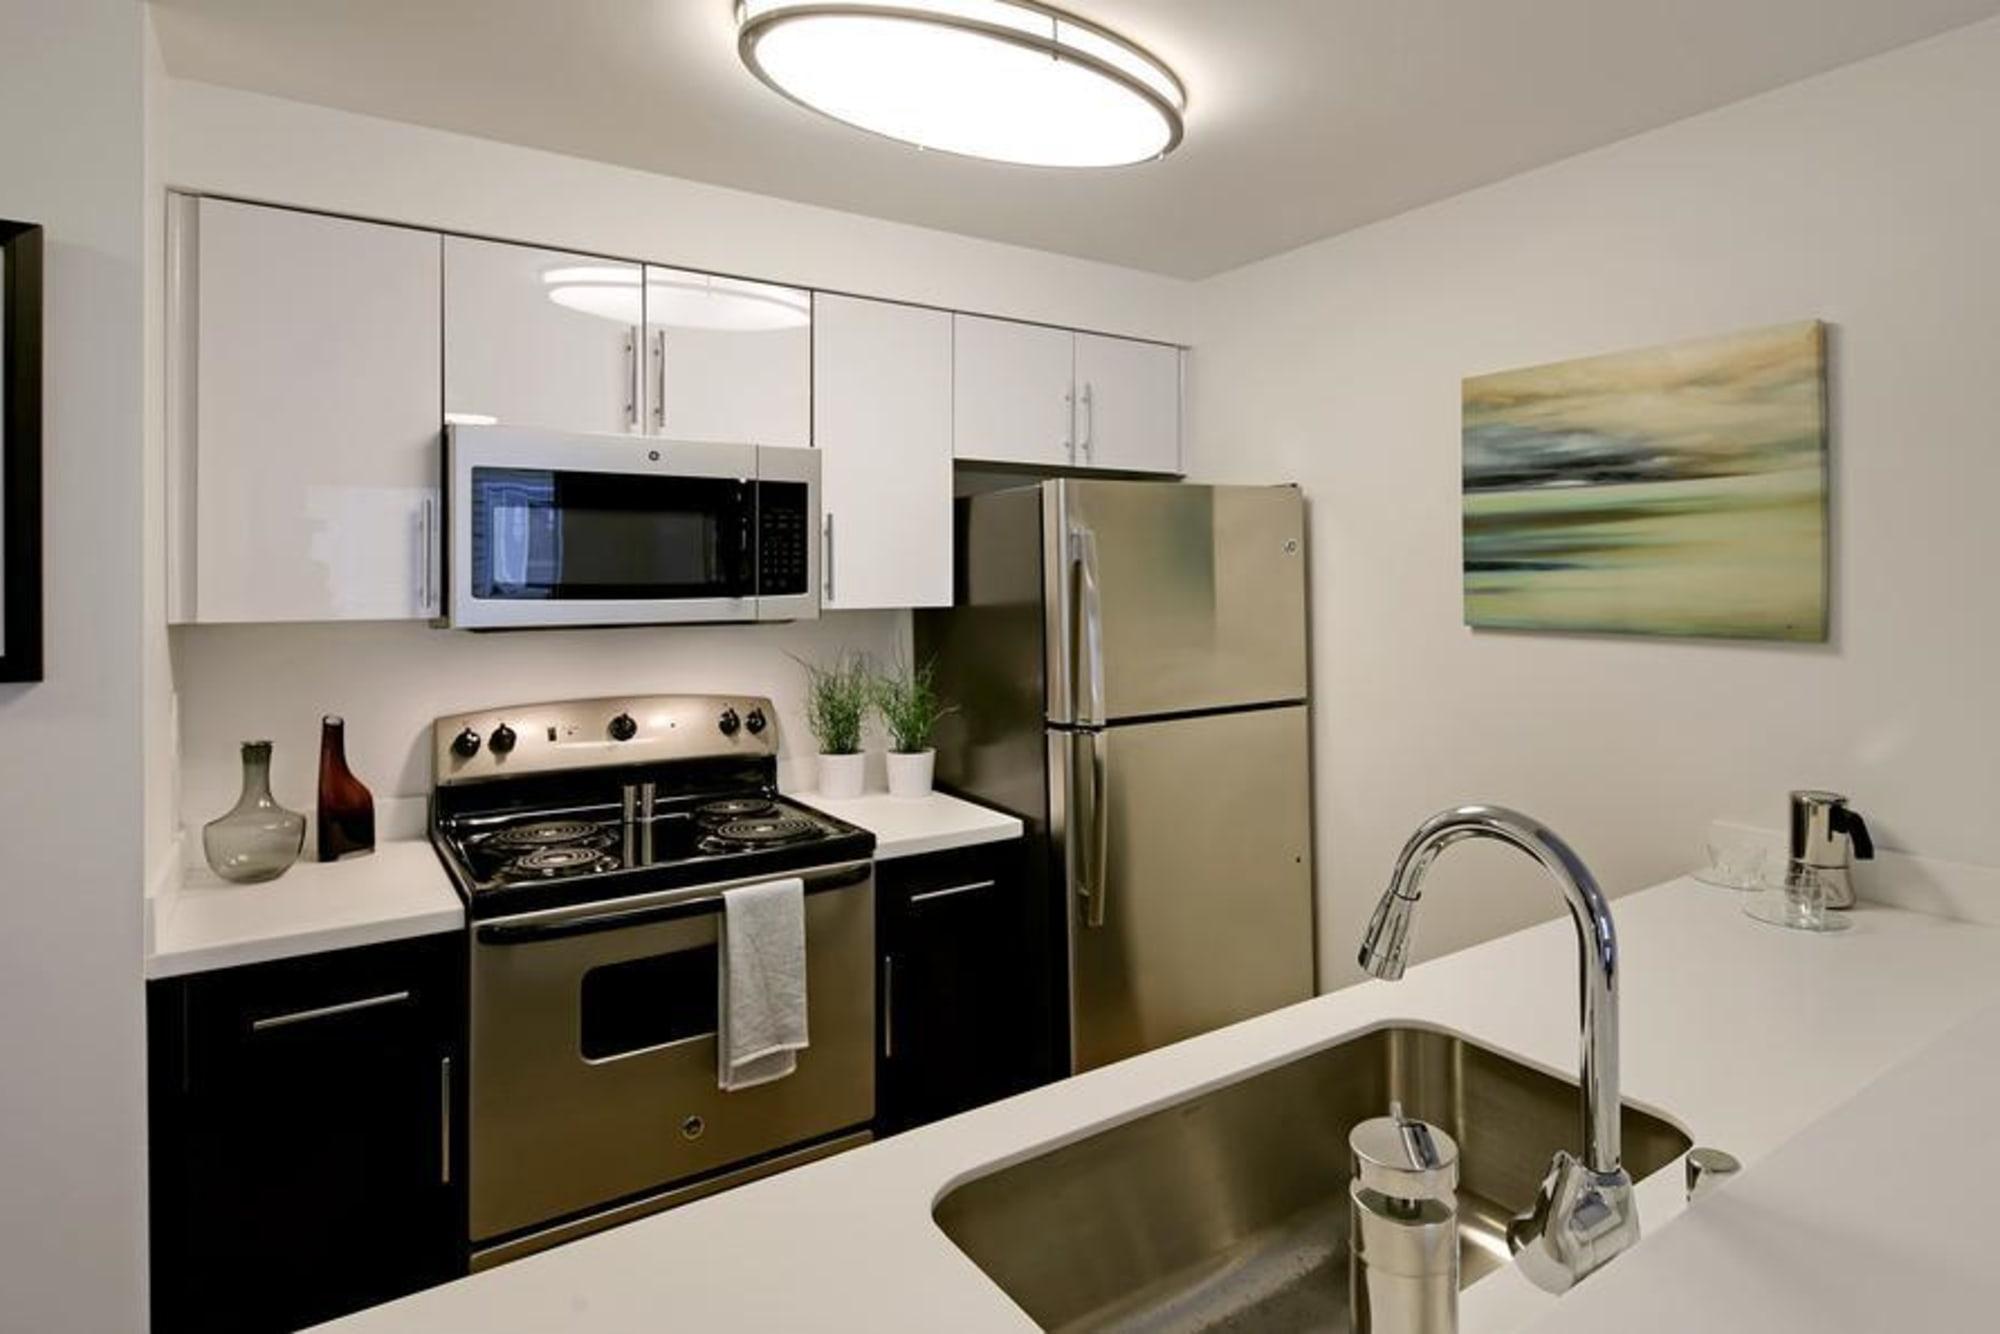 white cabinet model spec at Elan 41 Apartments in Seattle, WA